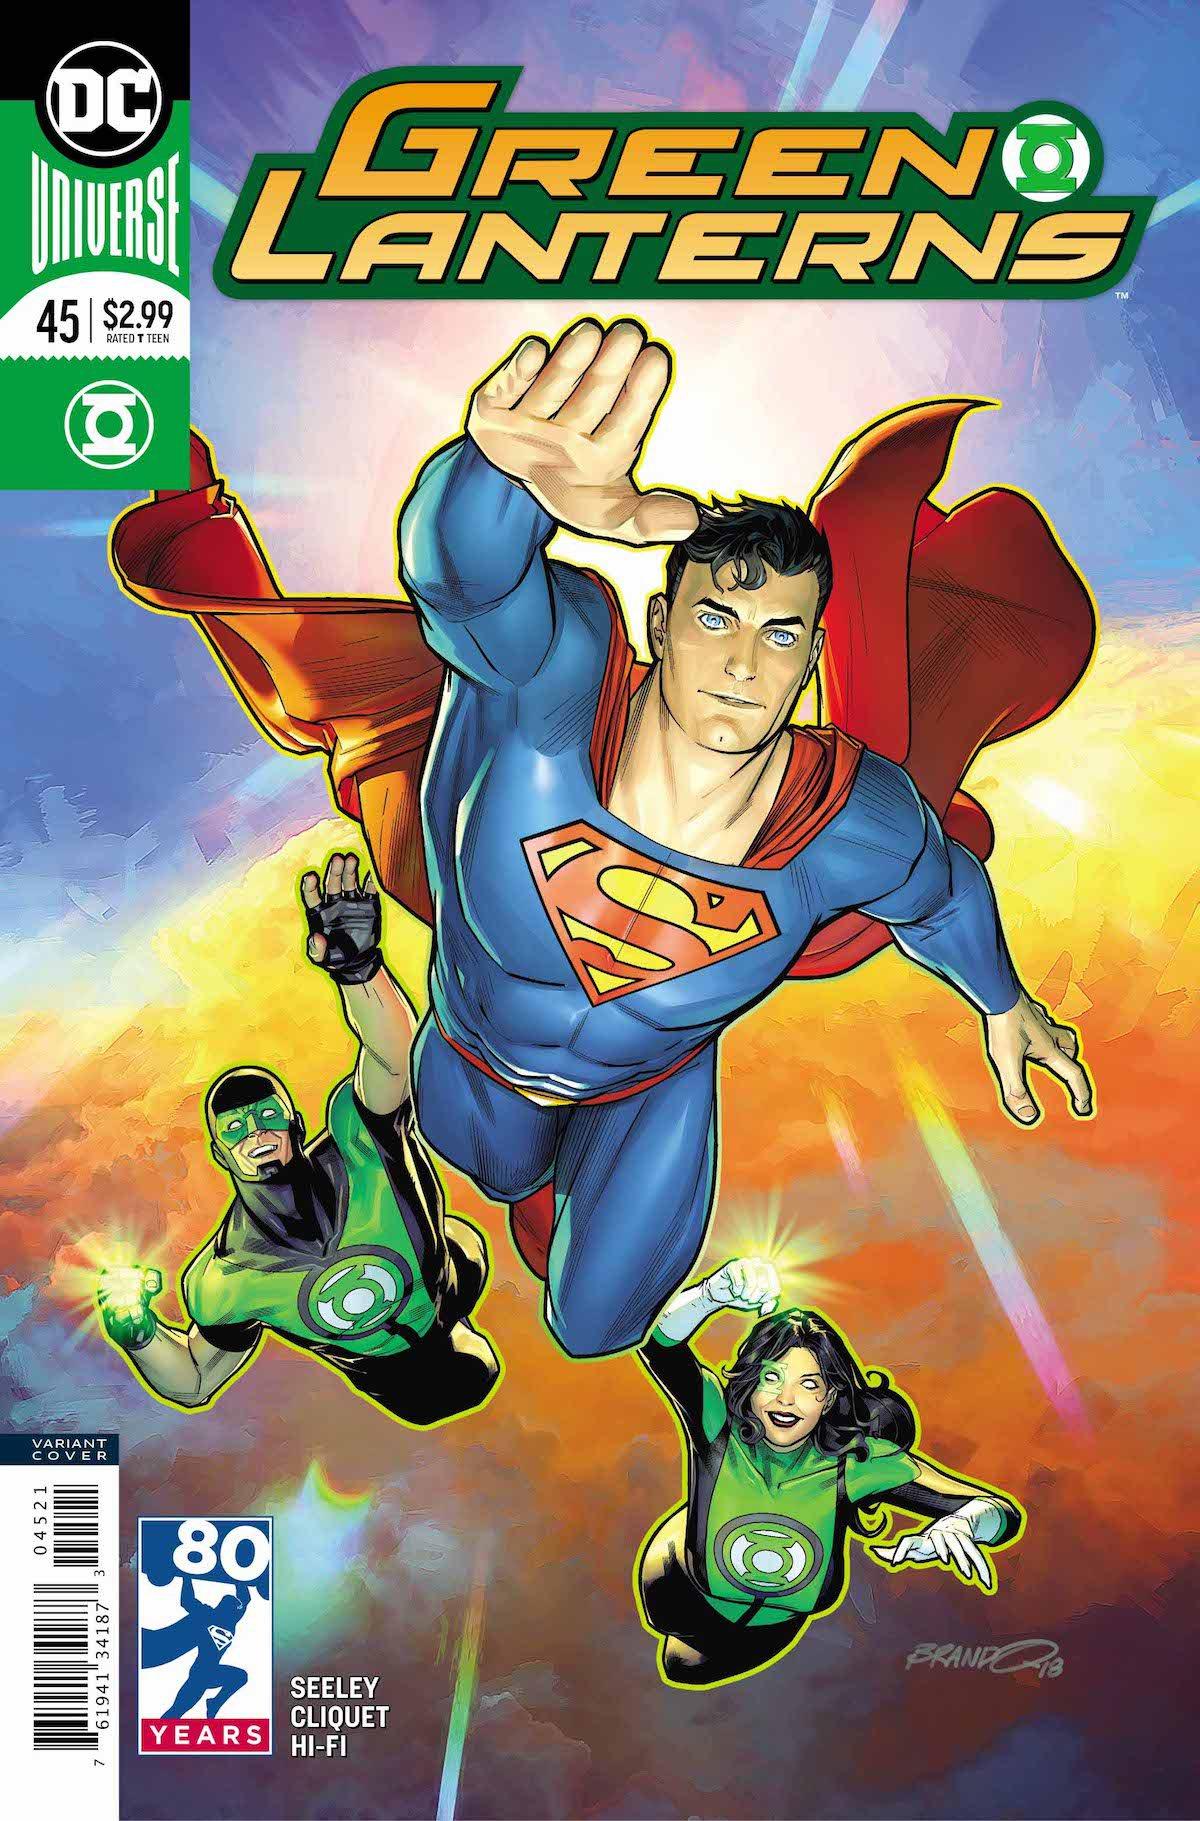 Green Lanterns #45 variant cover